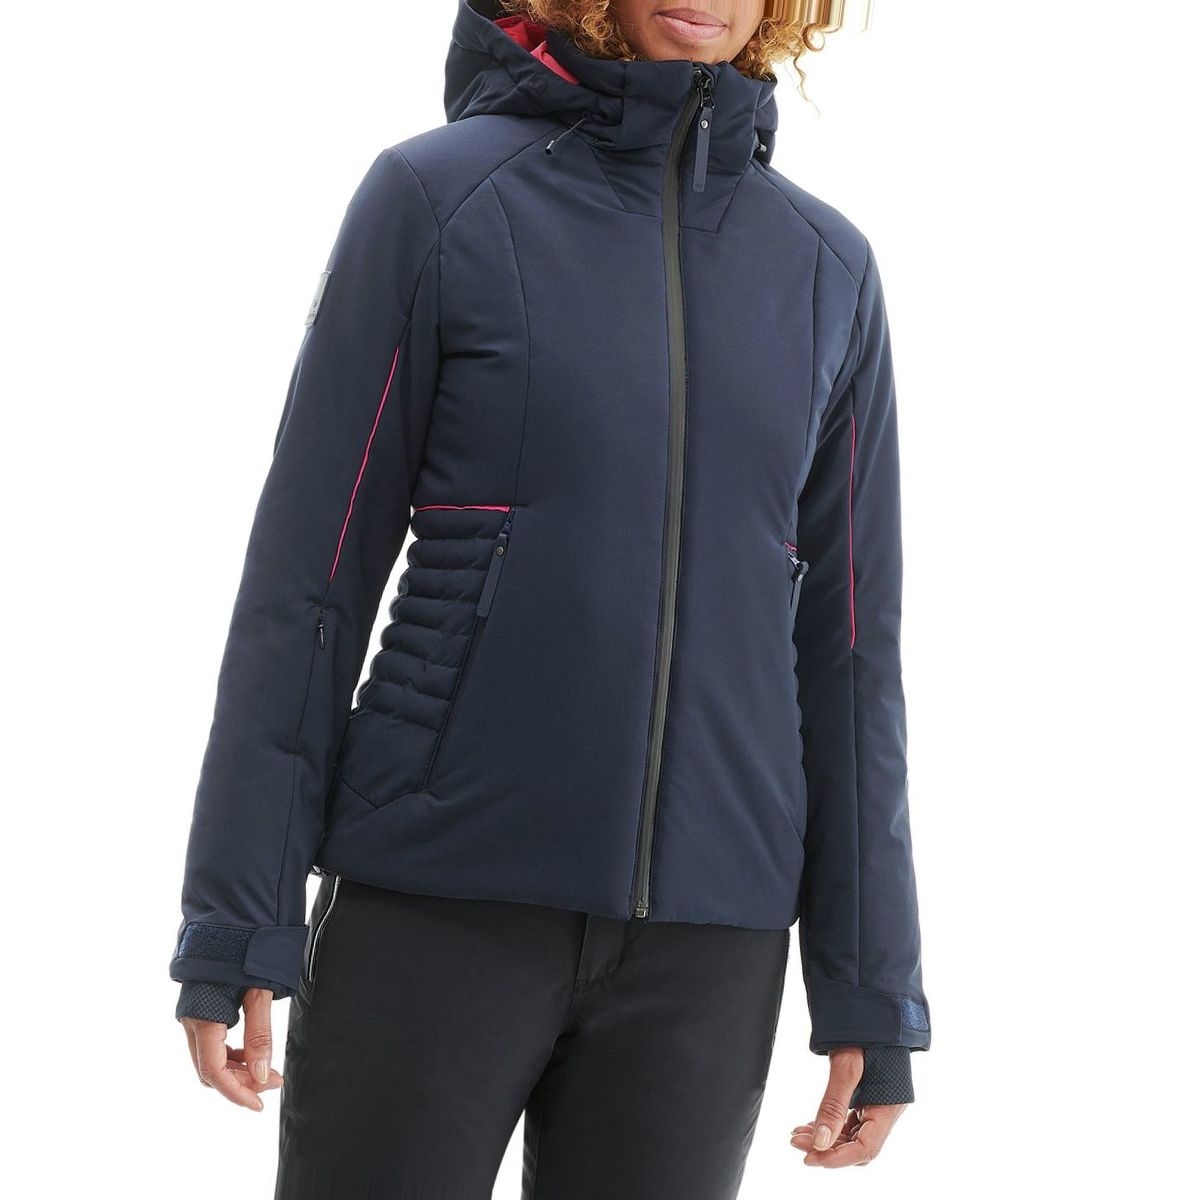 Eider Ridge 2.0 Jacket - Women's